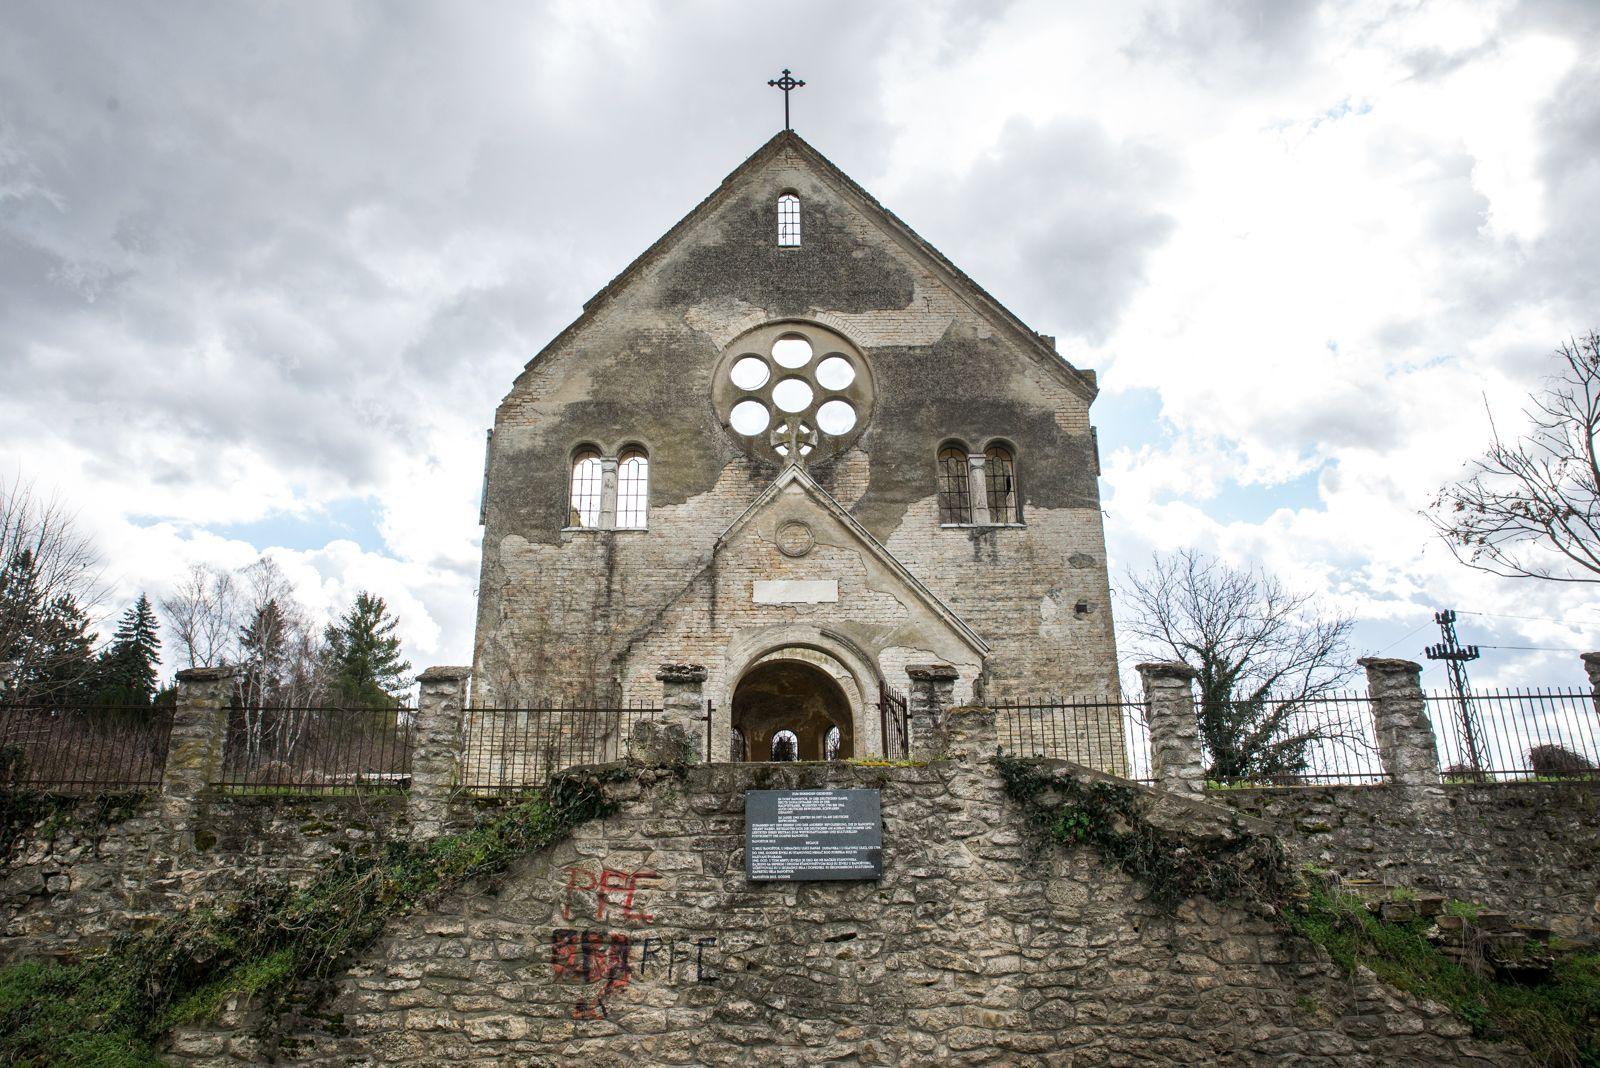 Beocin foto Jelena Ivanovic -16 crkva banostor1